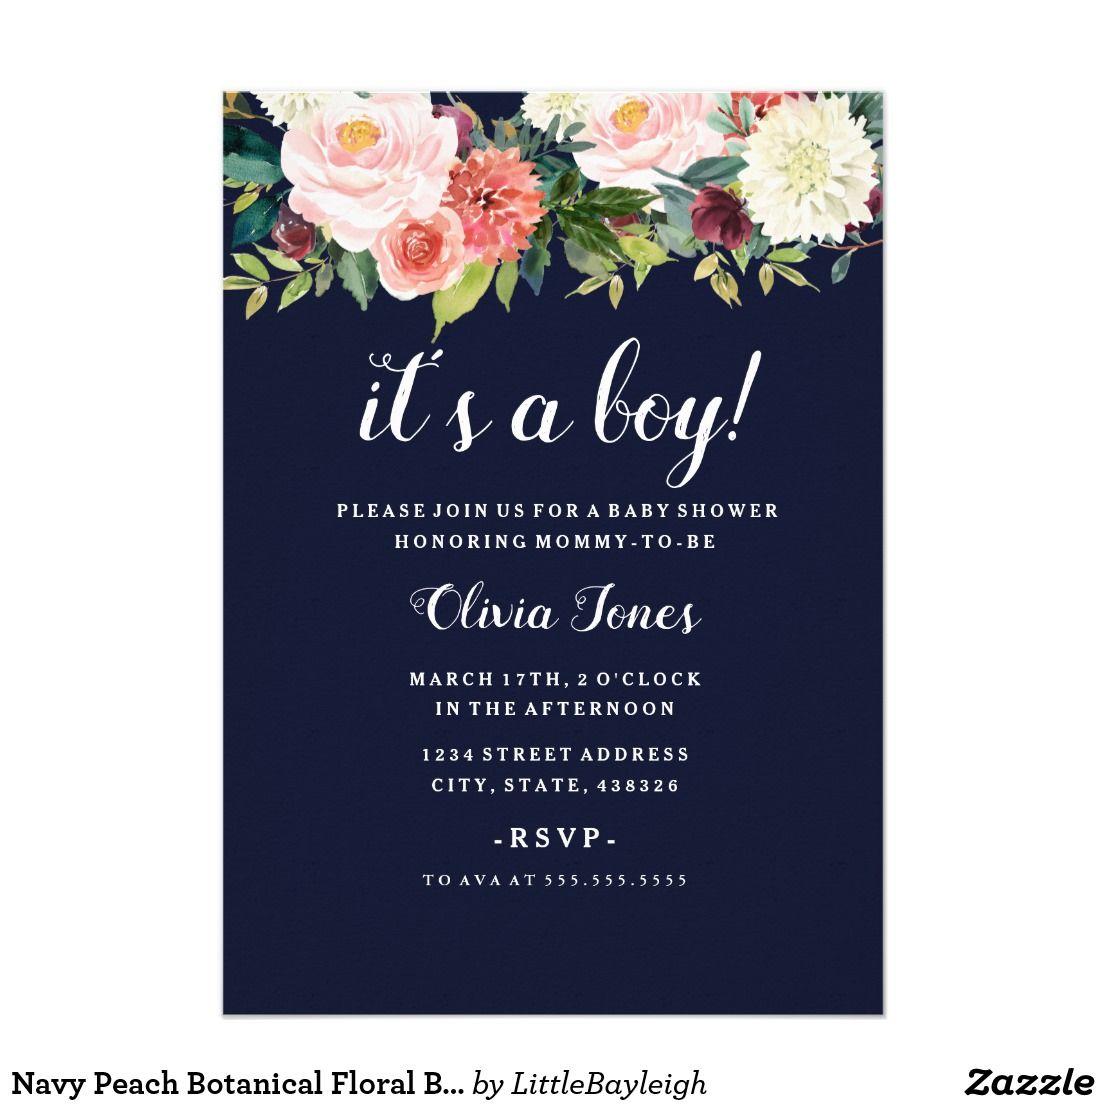 Navy Peach Botanical Floral Baby Shower Card